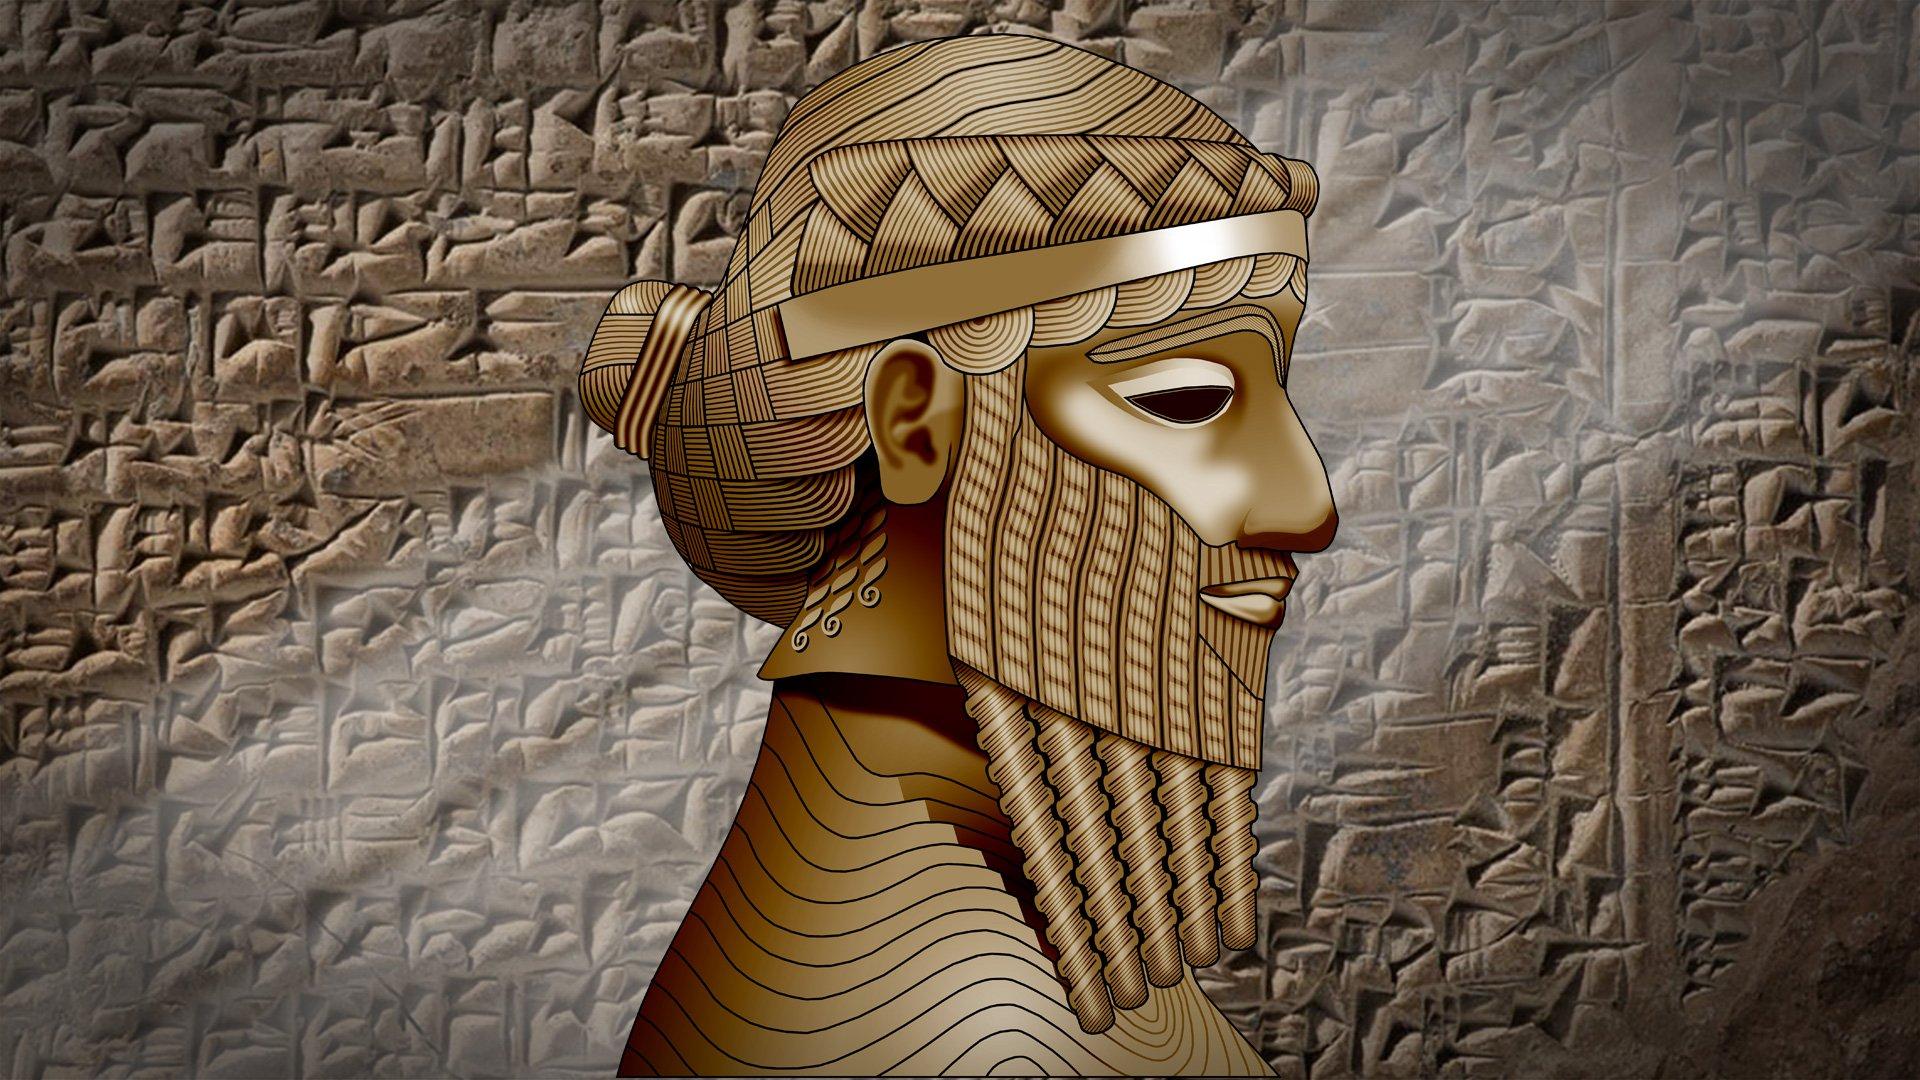 Sumerian Ancient Aliens Anunnaki Propaganda In Mesopotamia |